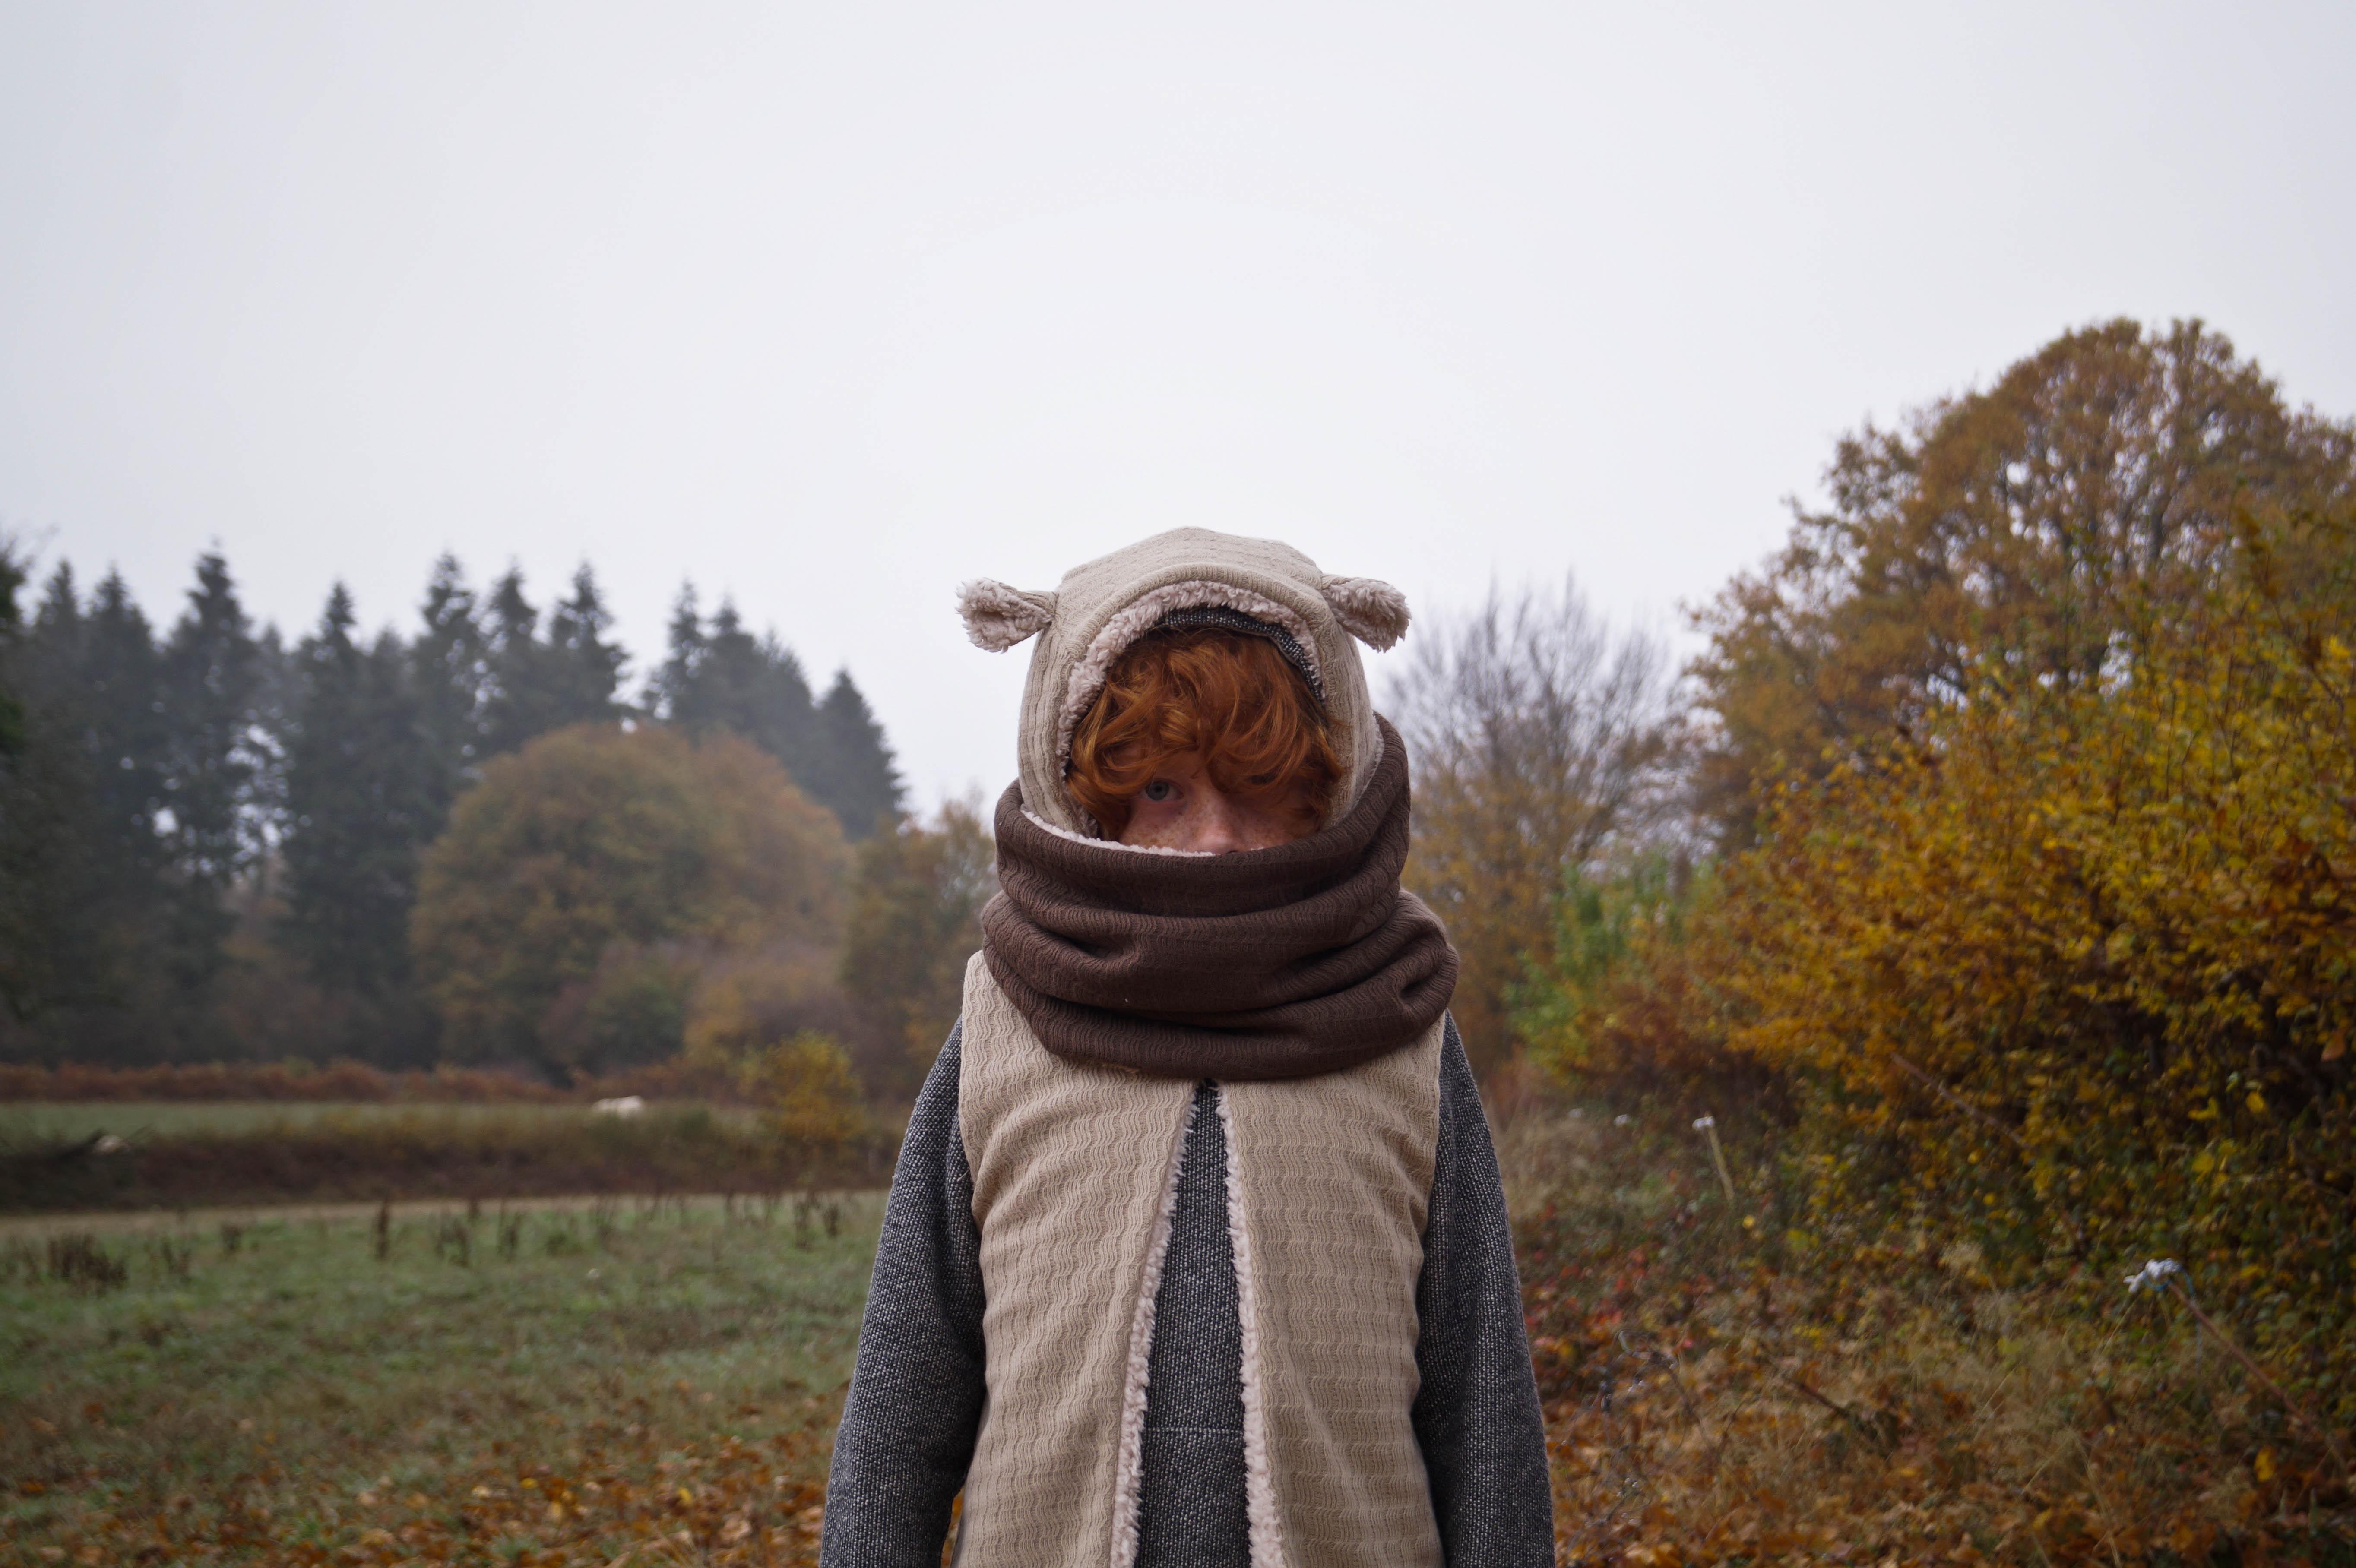 Shooting automne Minabulle garçon raleur